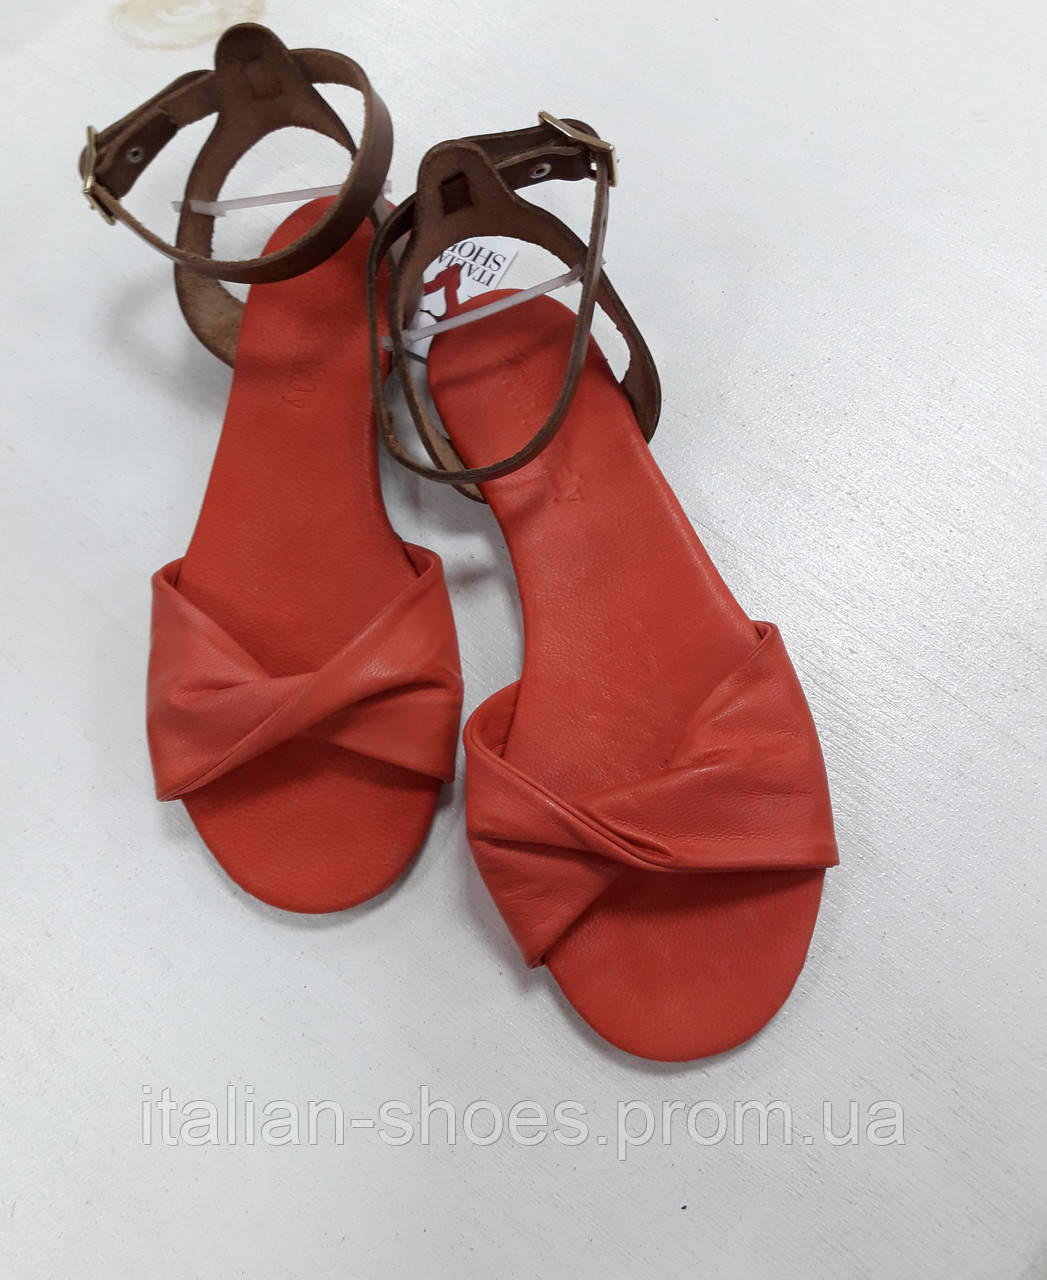 Коралловые кожаные сандалии Donna Italia